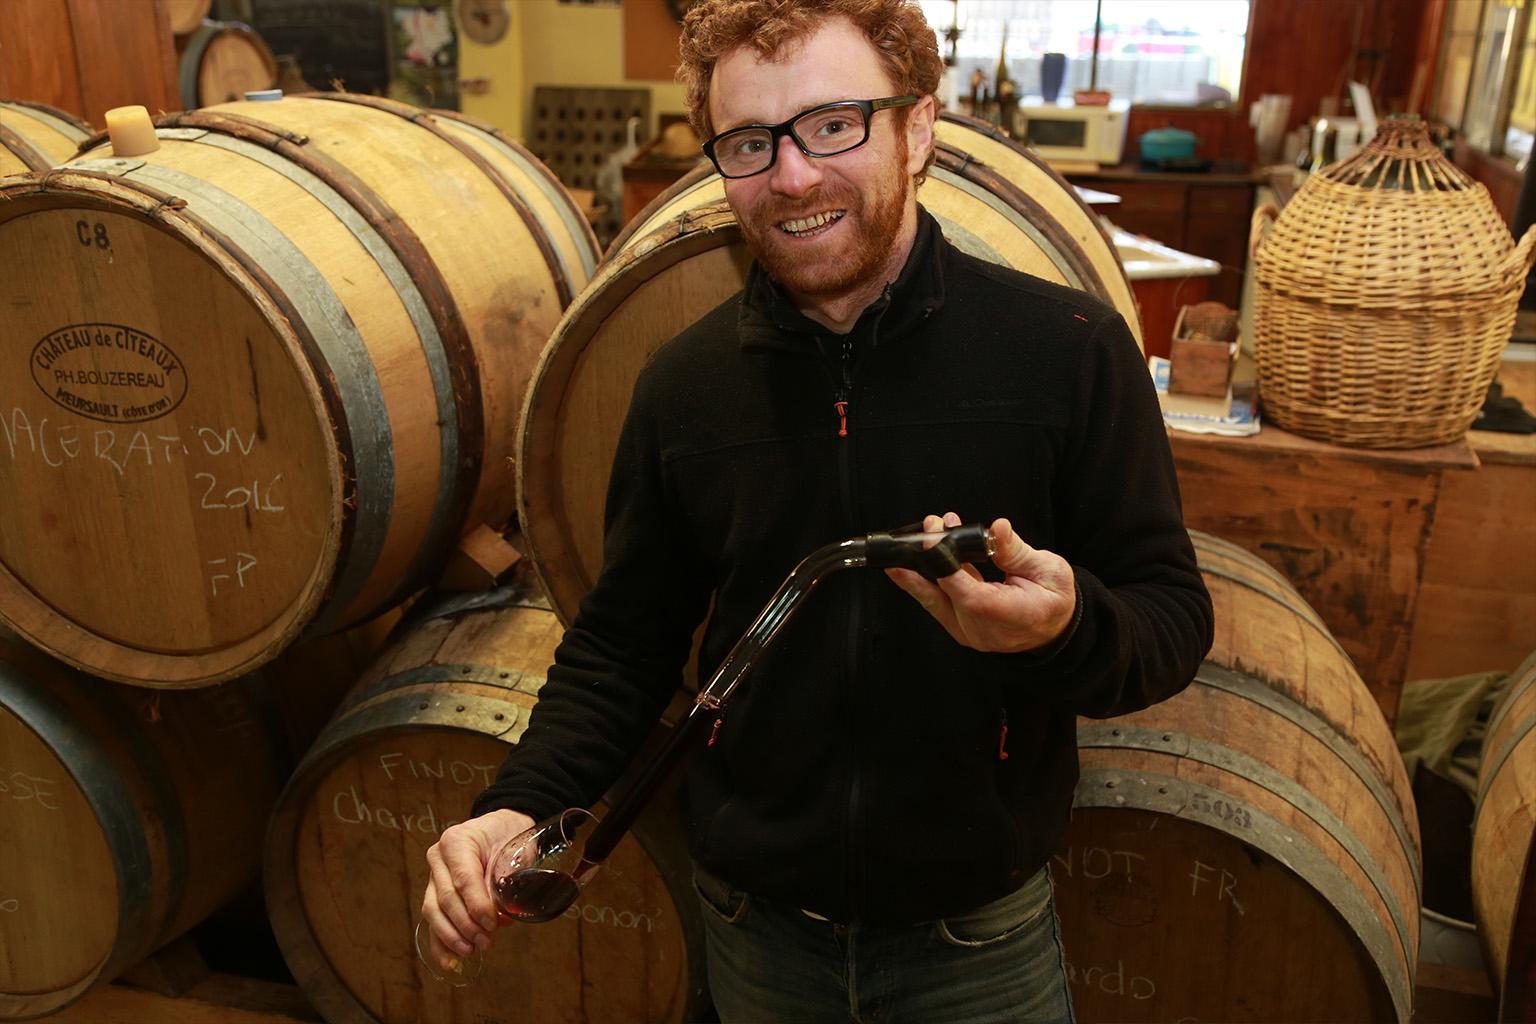 Domaine Thomas Finot - アペロ ワインバー / apéro WINEBAR - vins et petits plats français - Minami Aoyama Tokyo